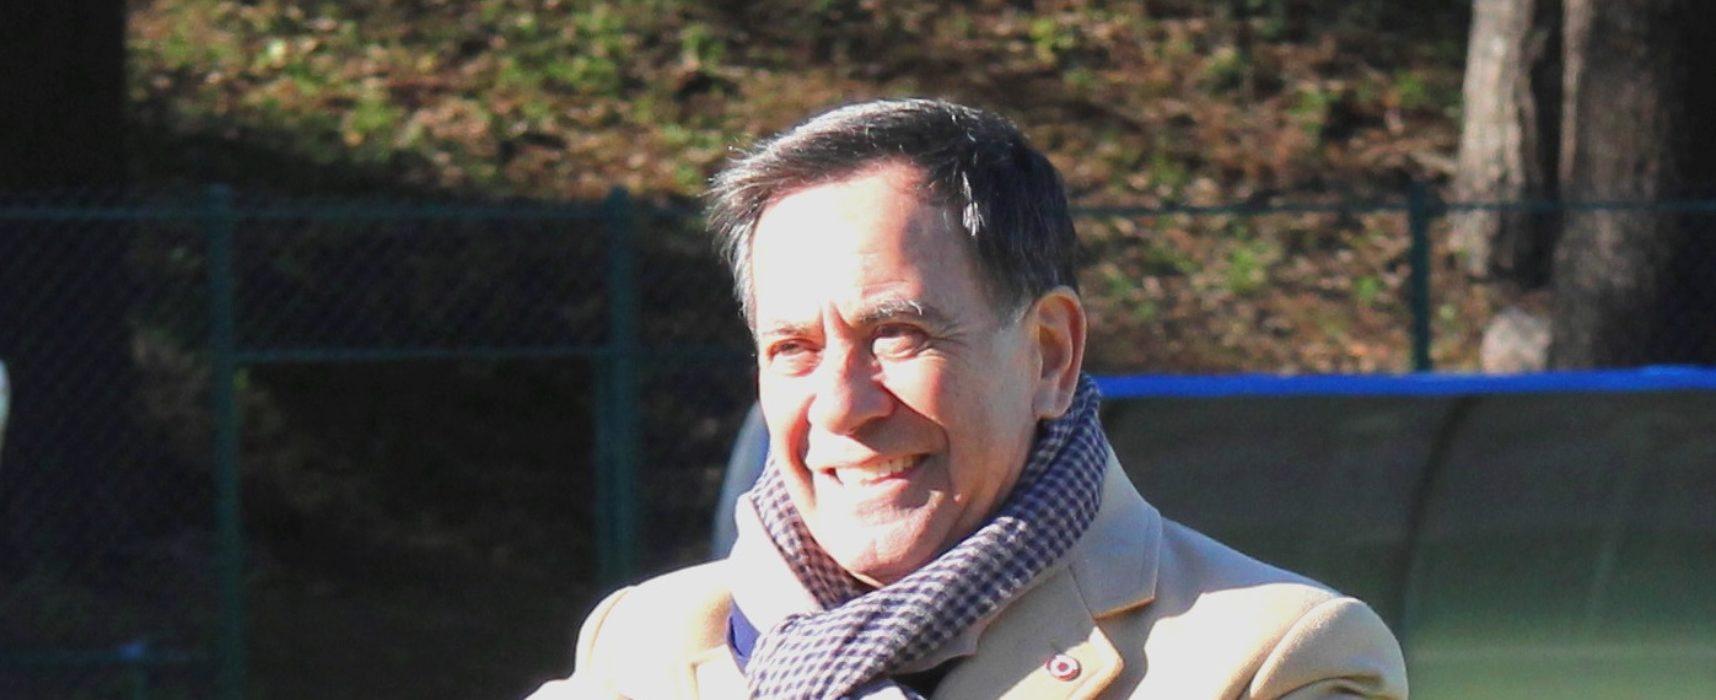 LEGA PRO E VITERBESE, LE RIFLESSIONI DEL PRESIDENTE BETTURRI